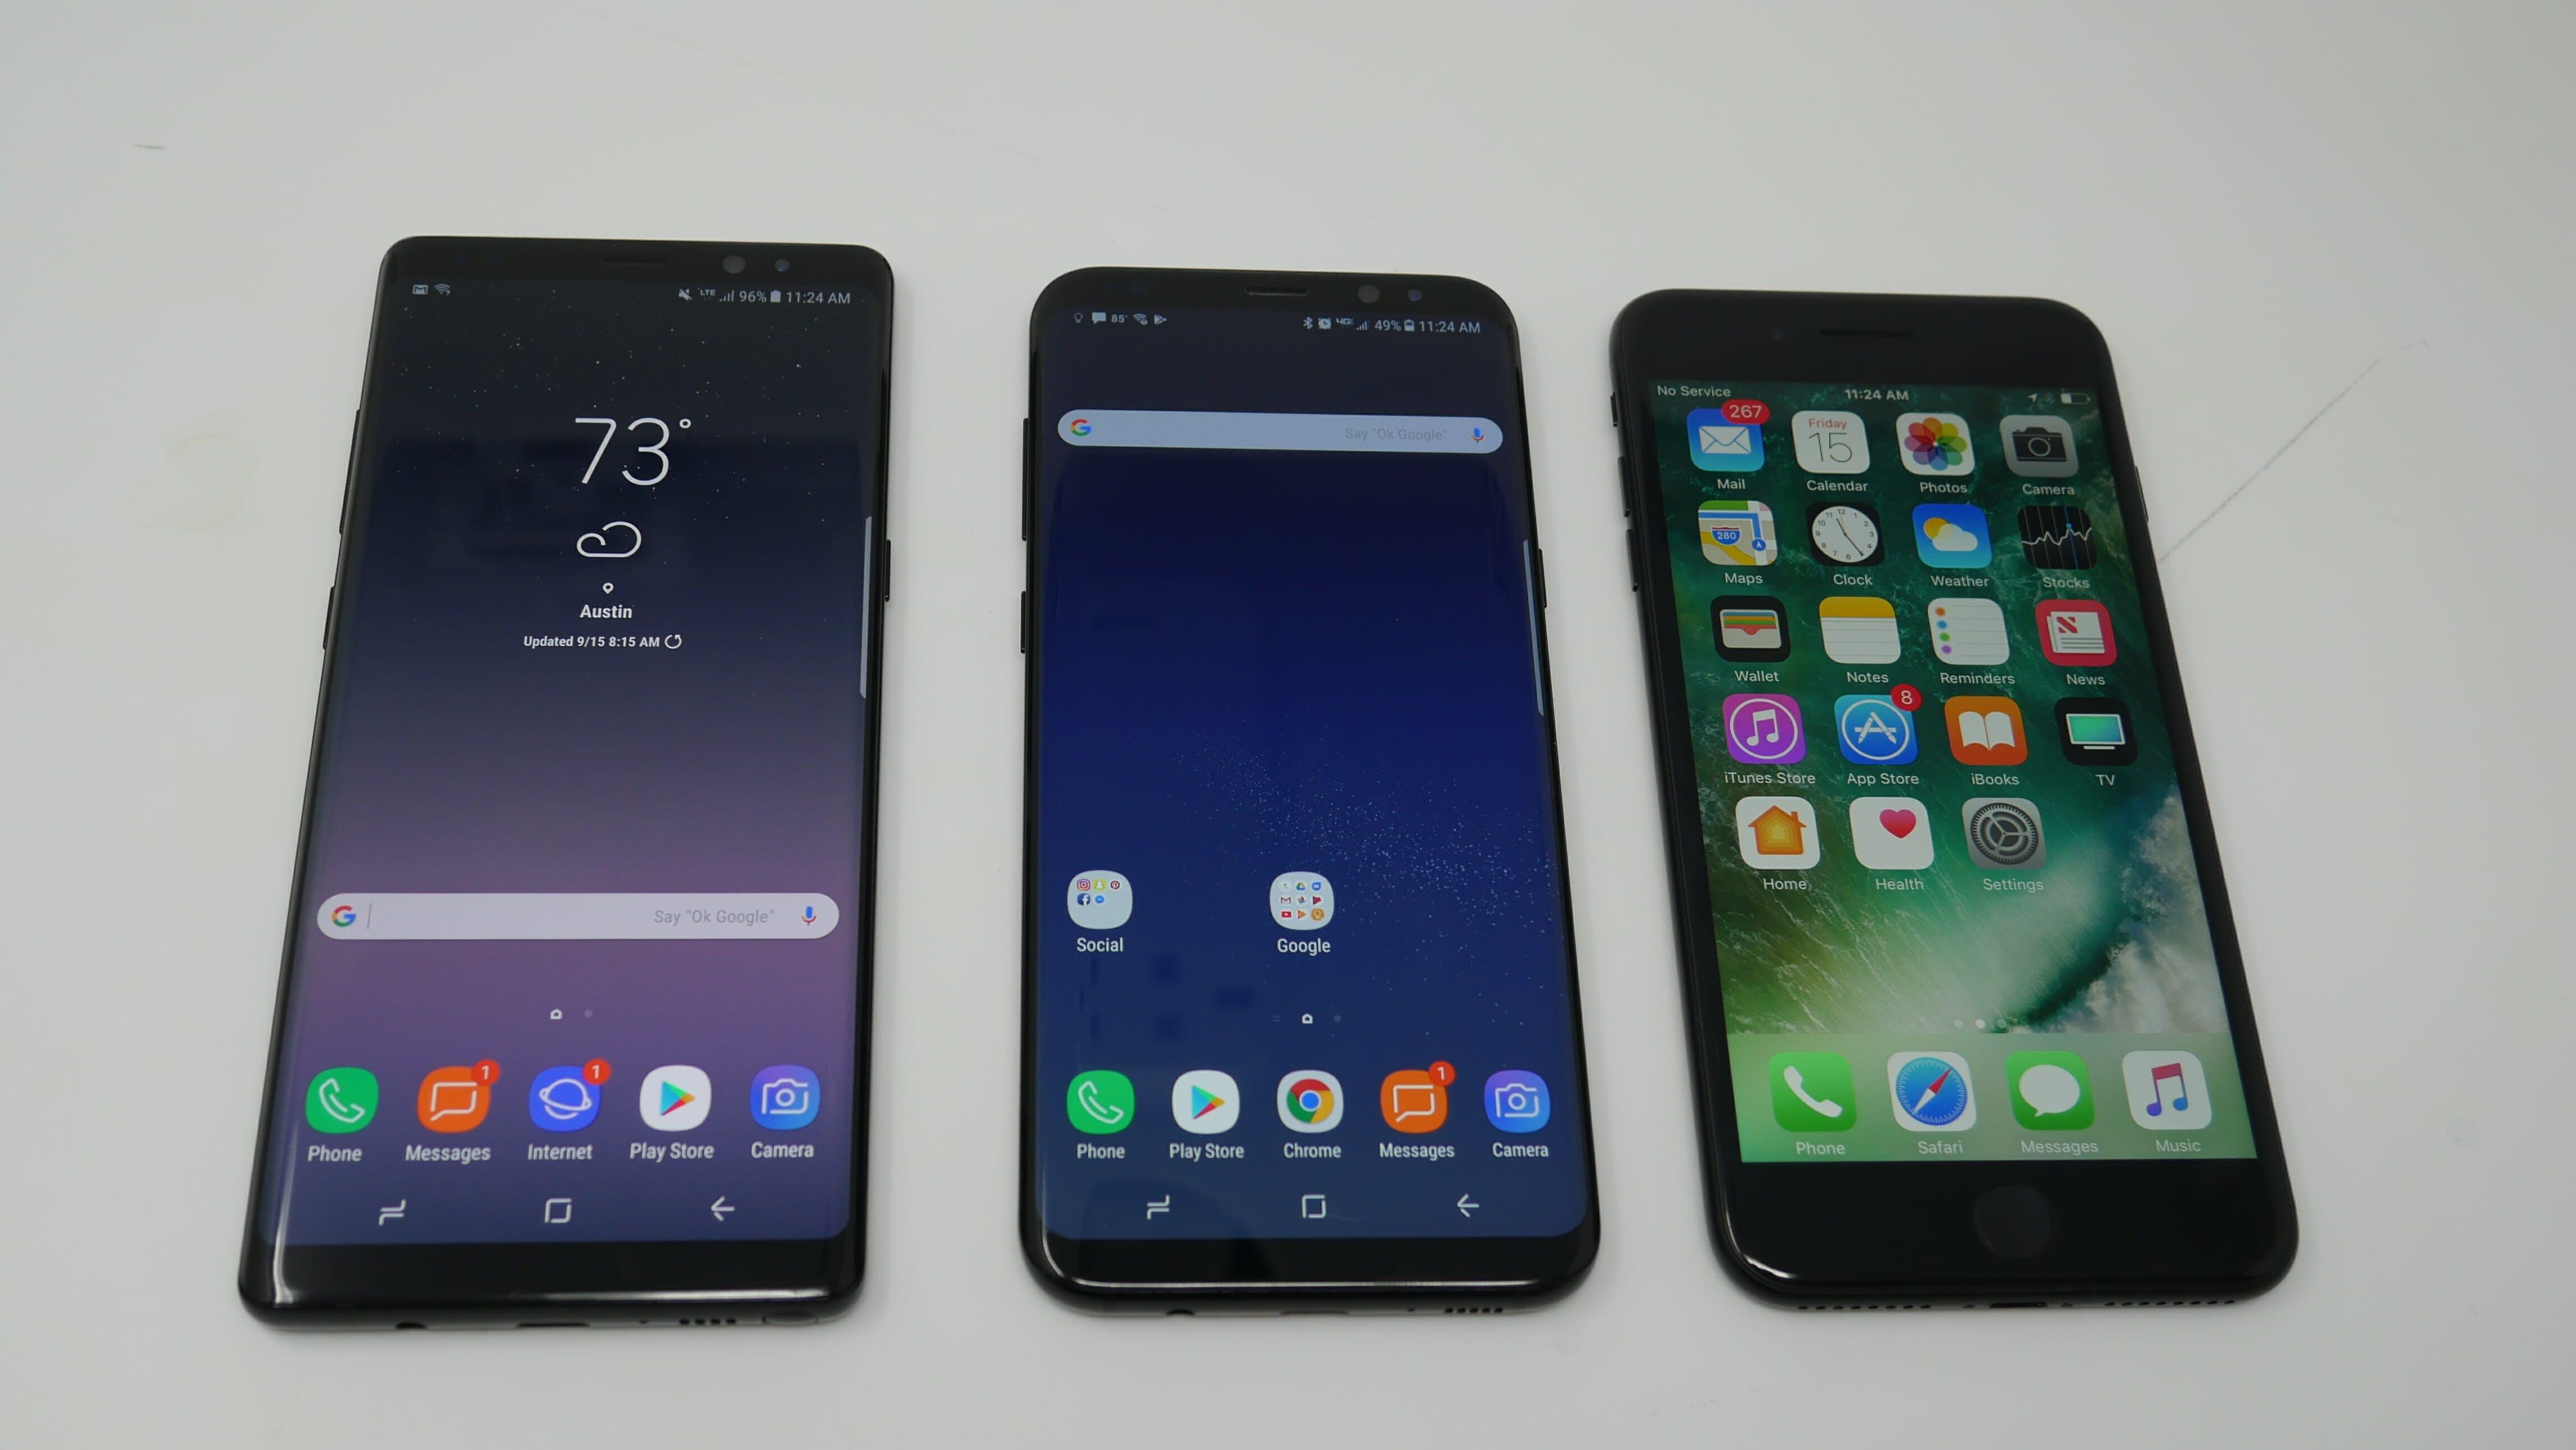 samsung galaxy note 8 vs. galaxy s8 vs. iphone 7 plus